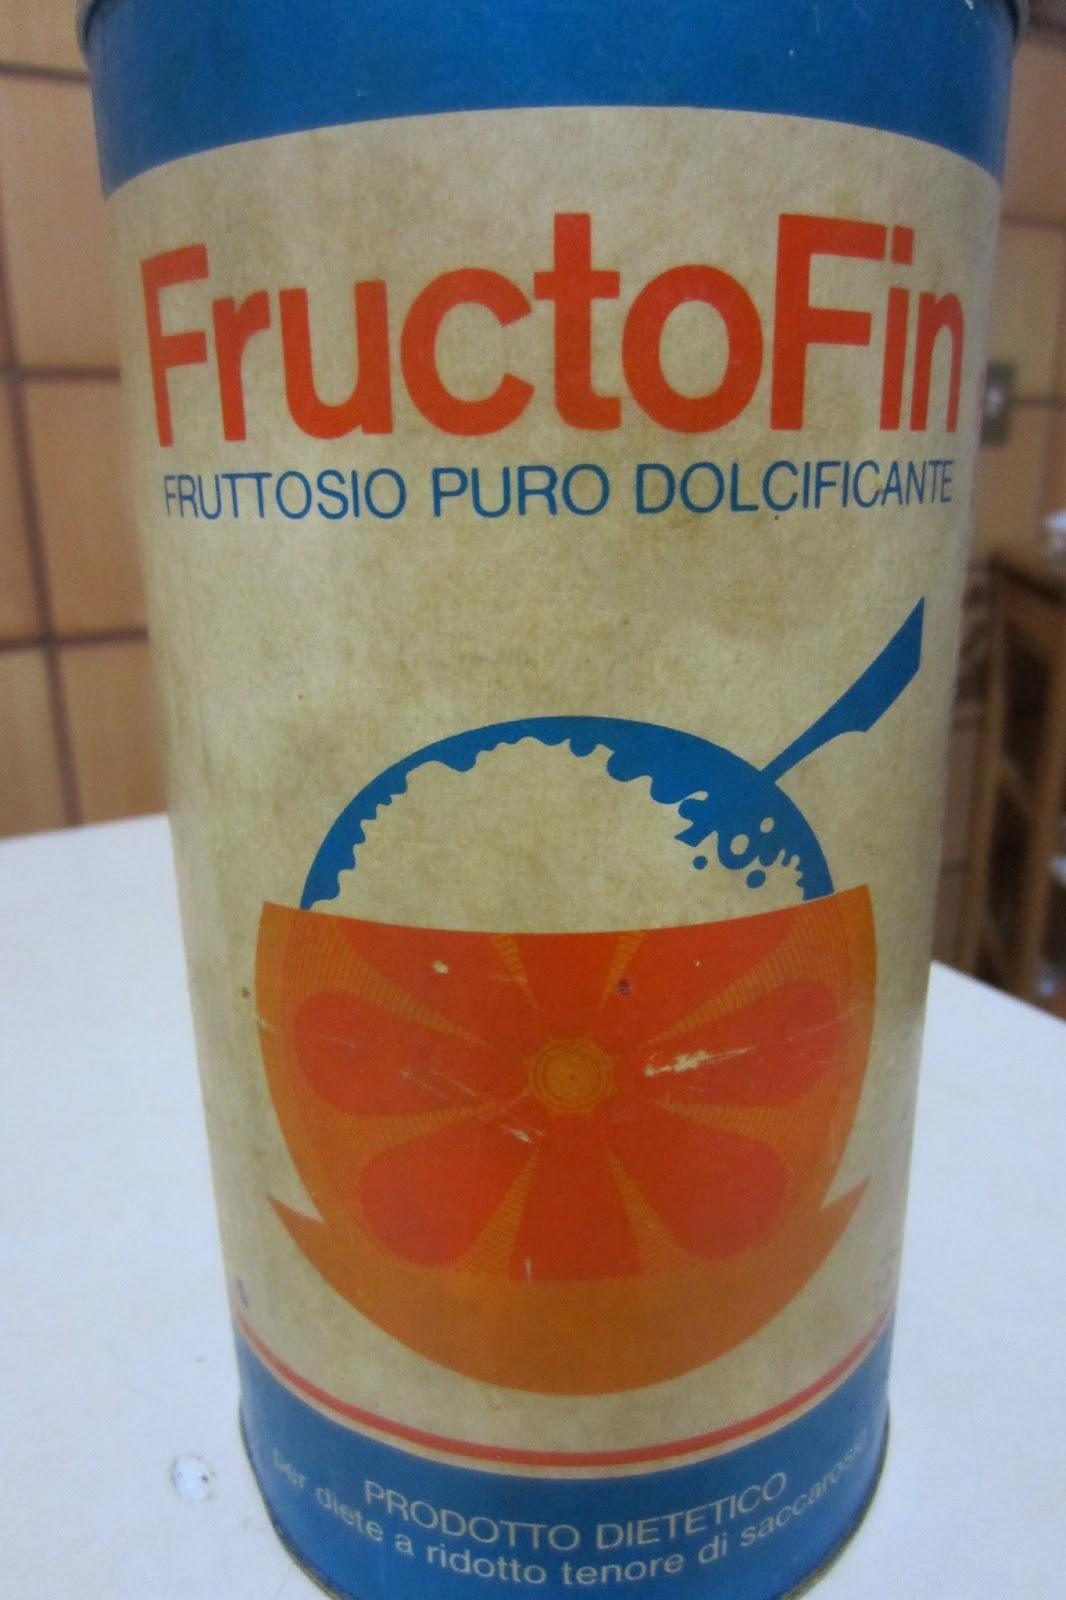 Sokeri Sulamispiste